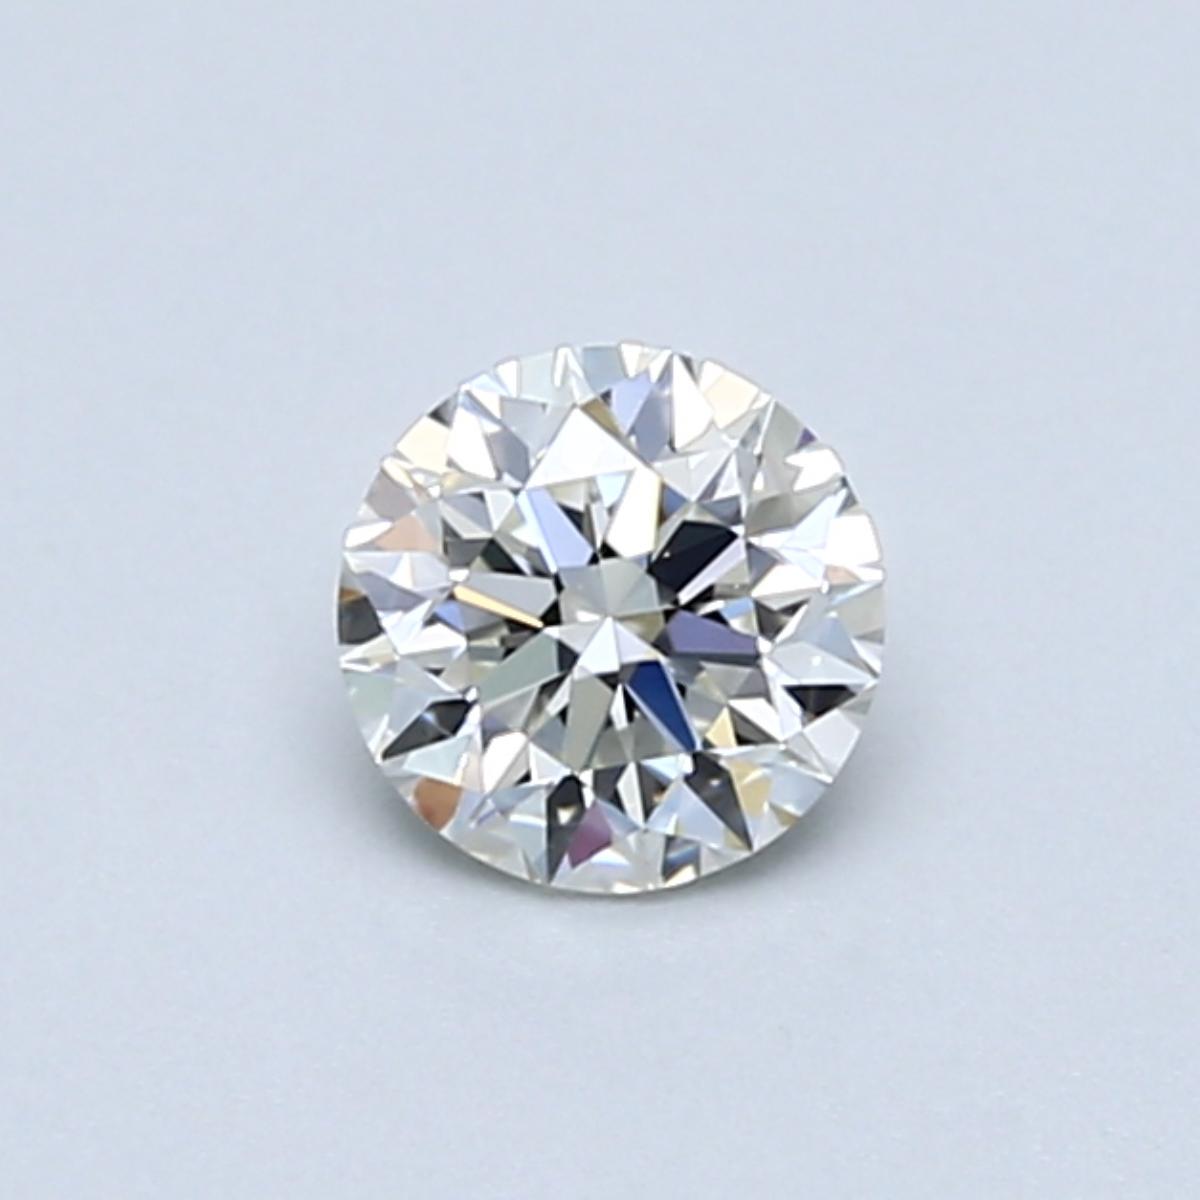 .50 carat Round Diamond, Very Good cut, graded by the GIA laboratories.